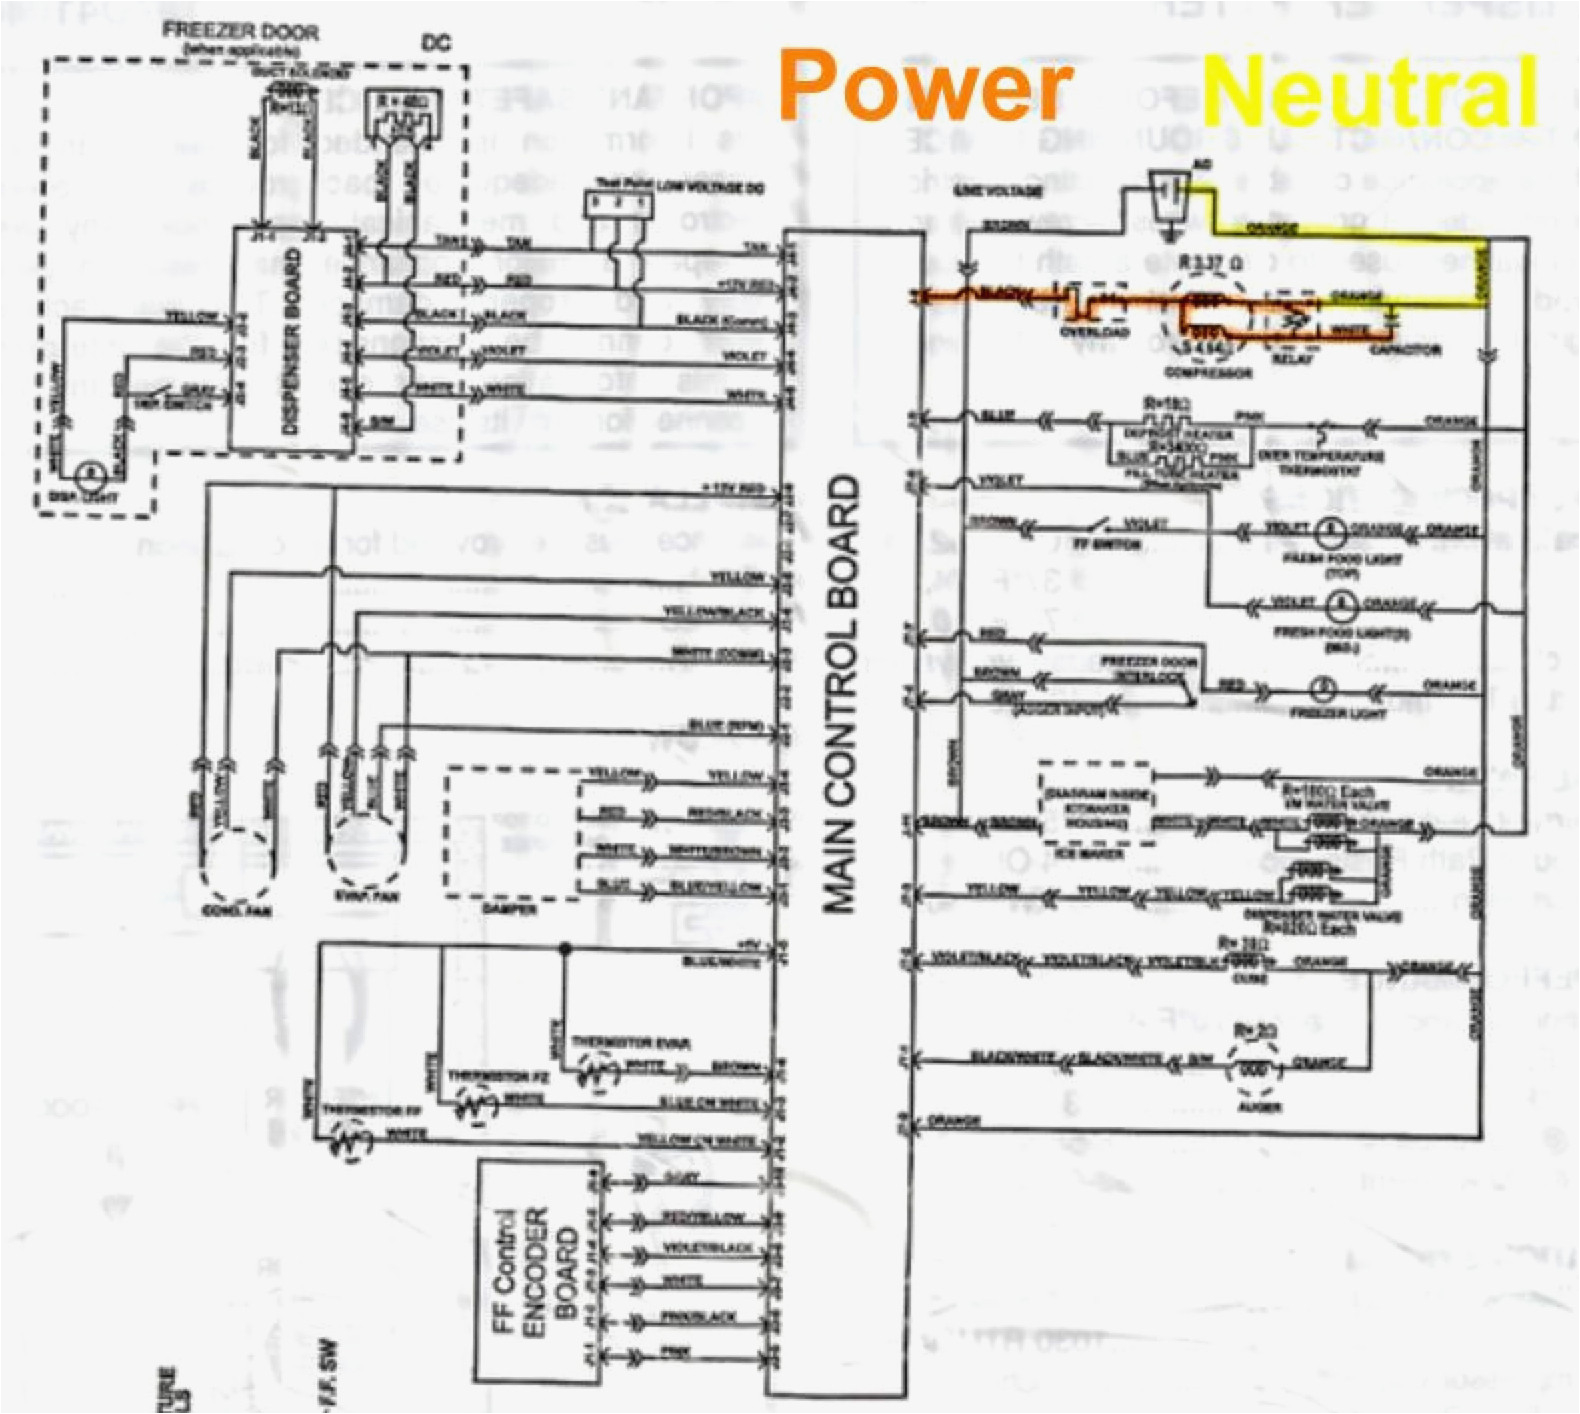 wiring diagram for walk in cooler wiring diagram save heatcraft walk in cooler wiring diagram walk in cooler wiring